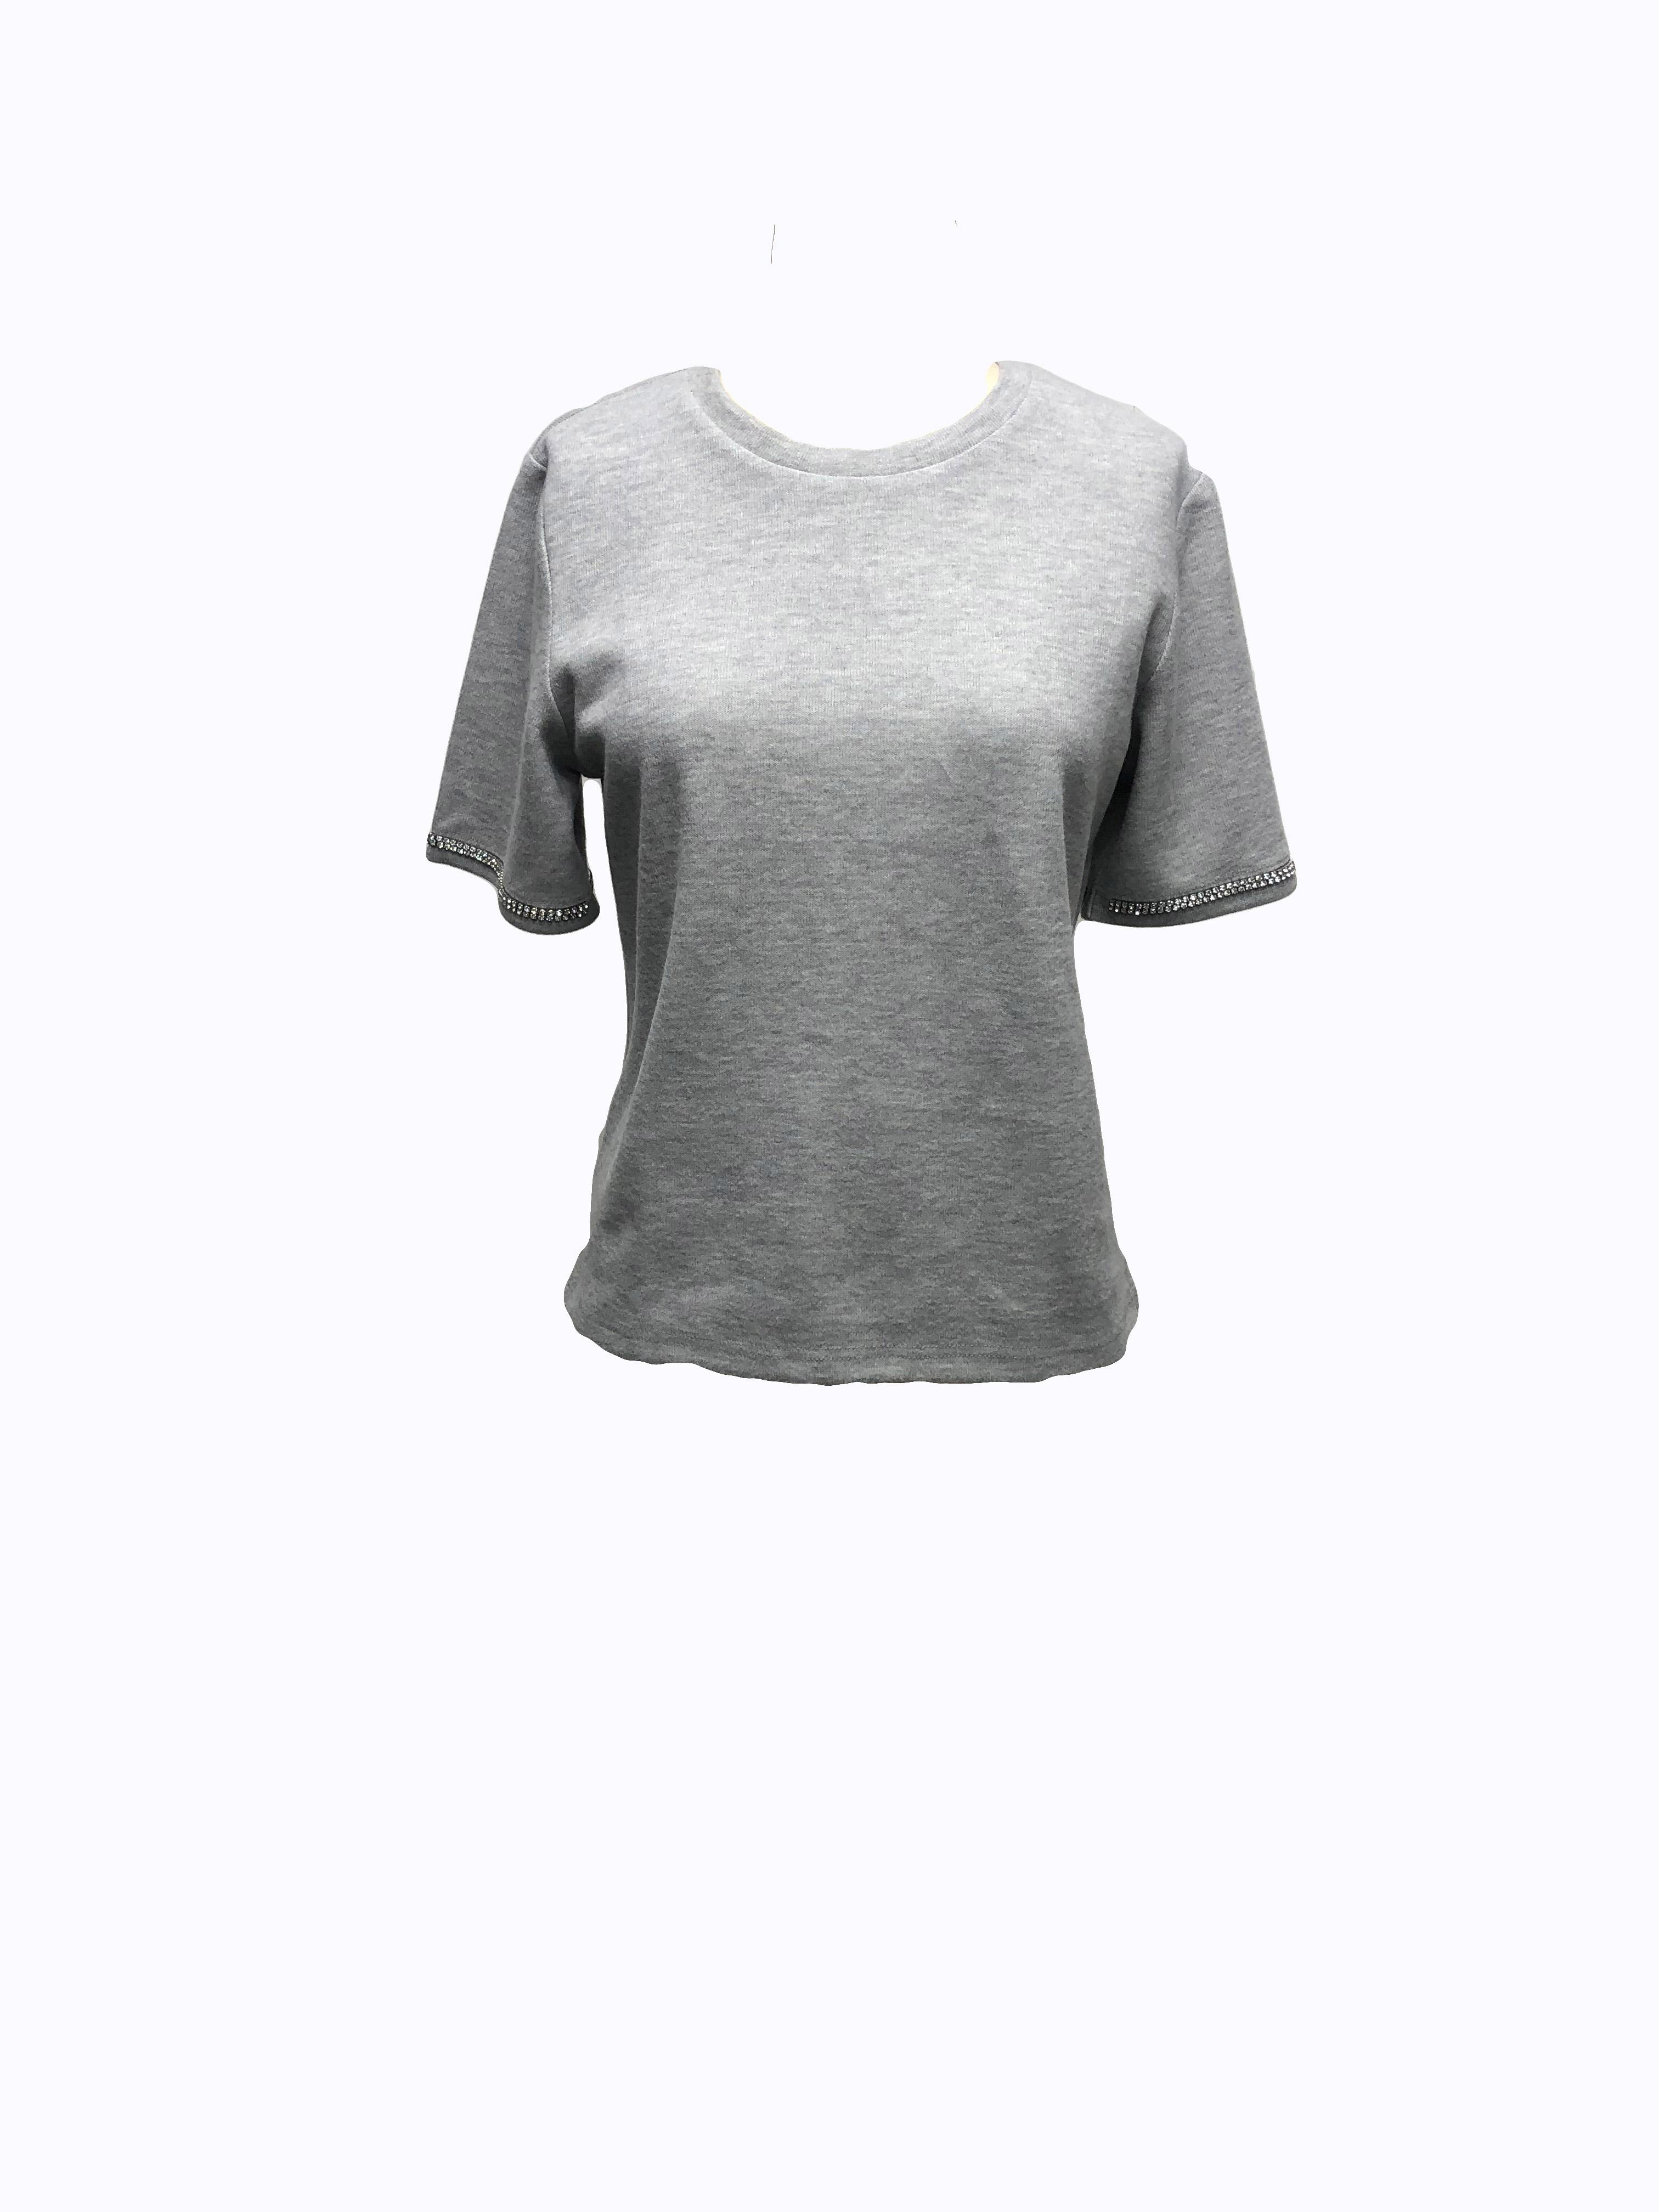 Sophia Diamond Trim Round Neckline Top -Gray - Front